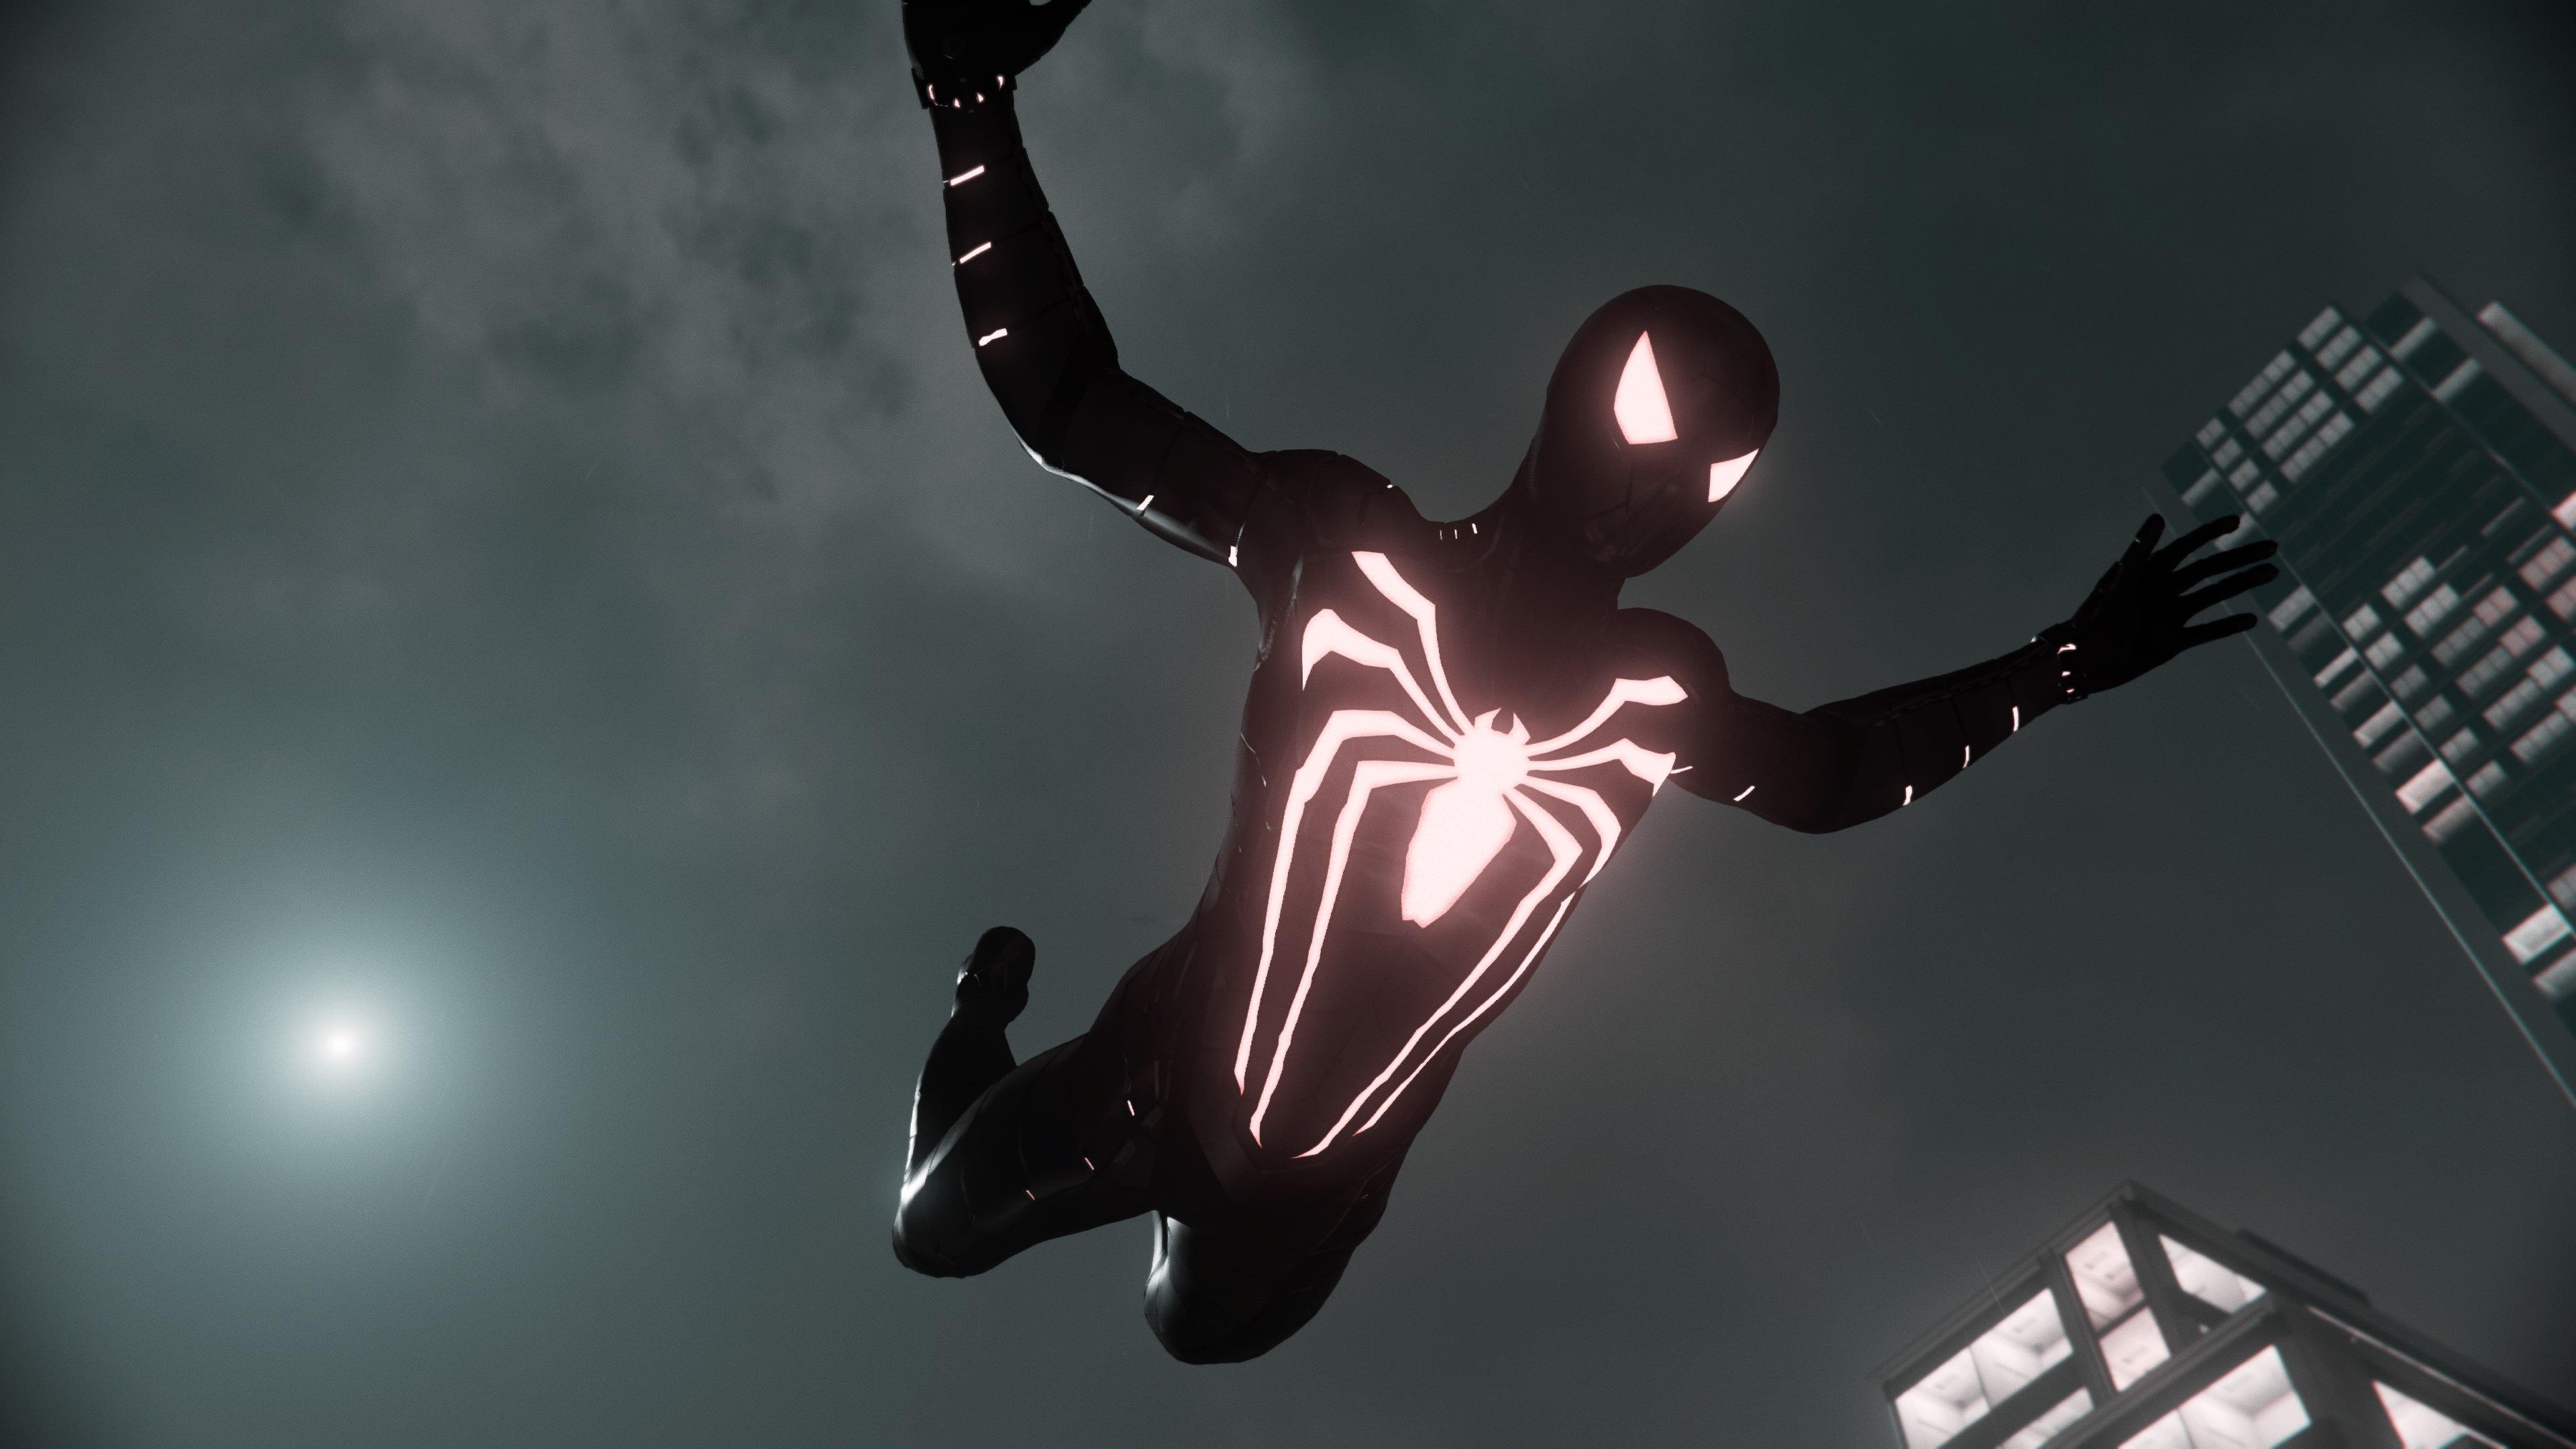 spider man armour mk 2 suit 4k 1538786499 - Spider Man Armour MK 2 Suit 4k - superheroes wallpapers, spiderman wallpapers, spiderman ps4 wallpapers, ps4 games wallpapers, ps games wallpapers, hd-wallpapers, games wallpapers, 4k-wallpapers